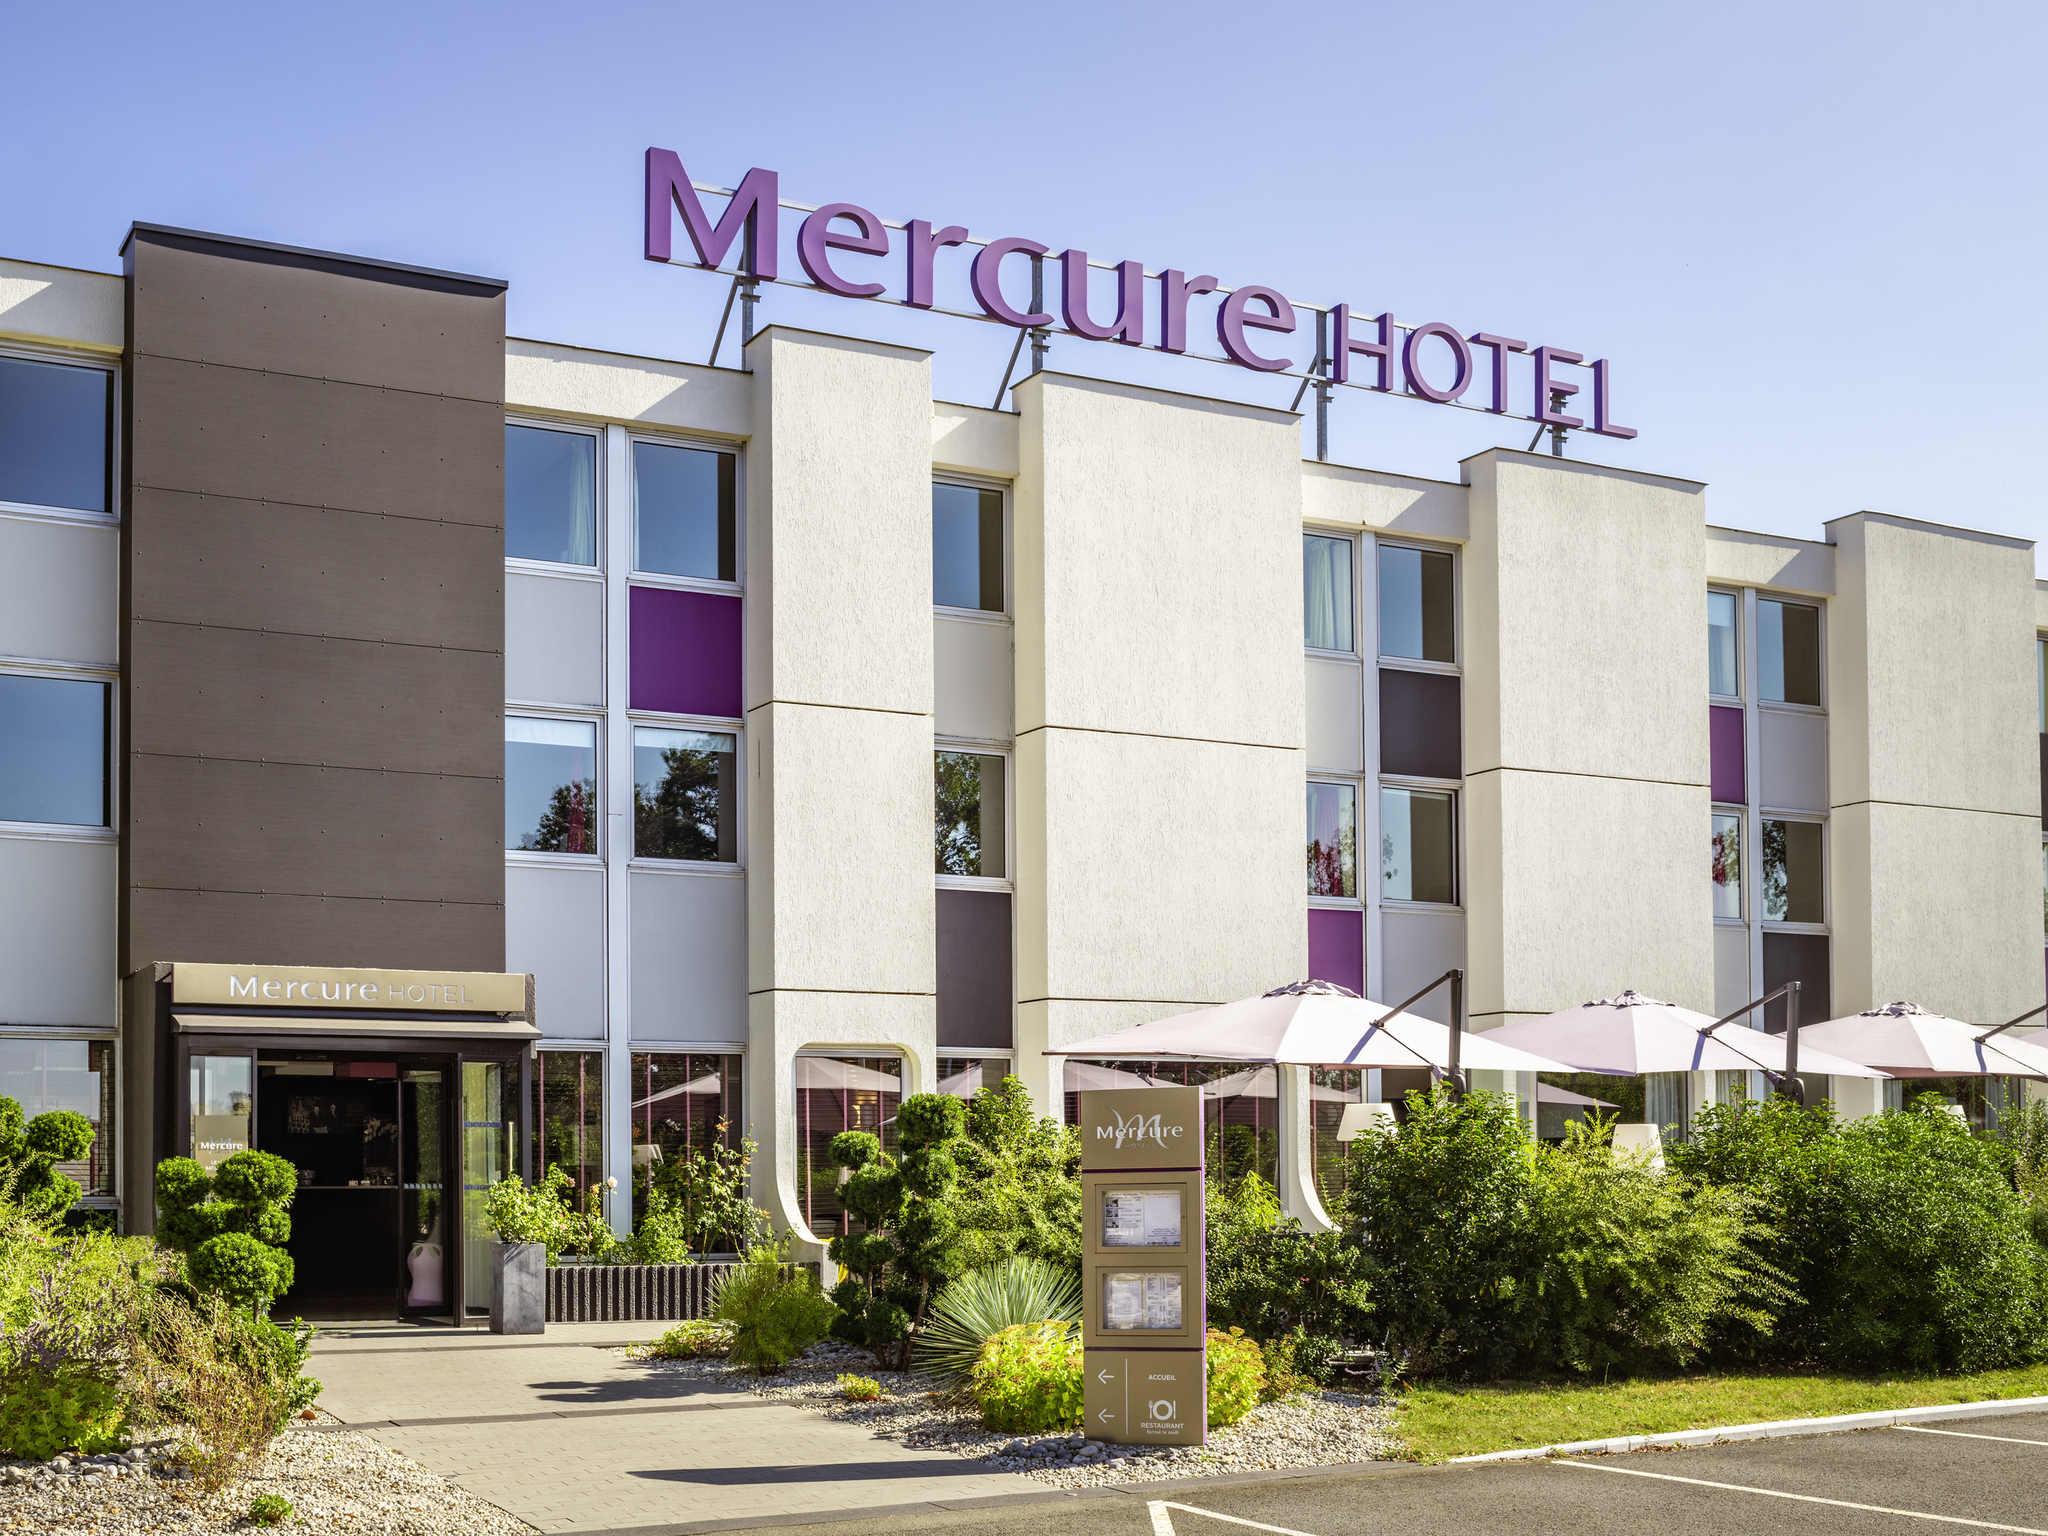 Hotel - Mercure Le Mans Batignolles Hotel